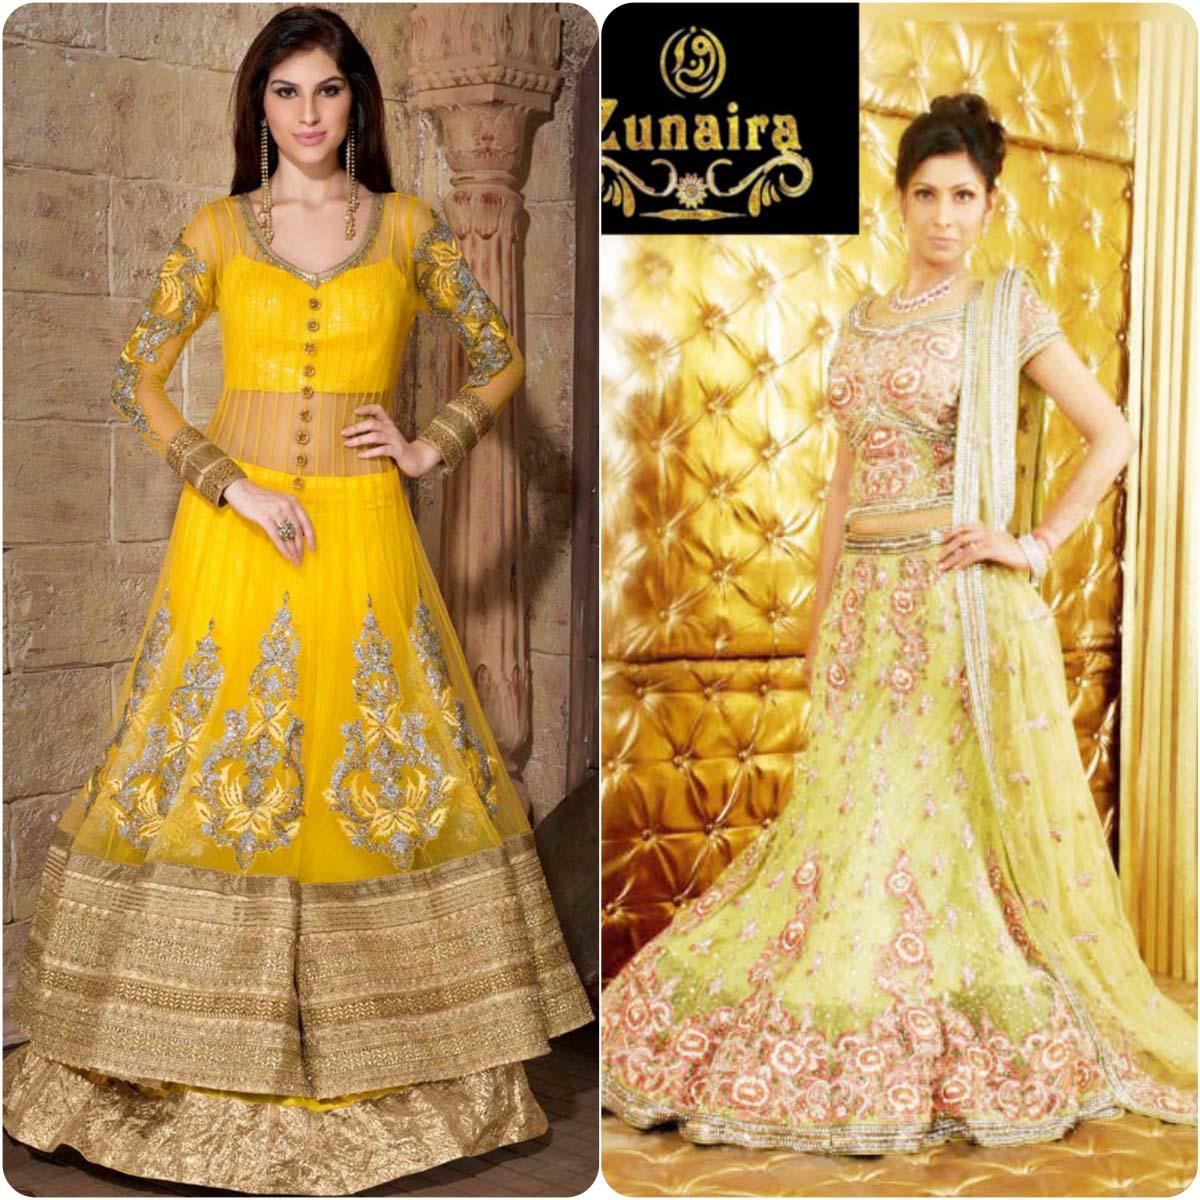 Beautiful Yellow Mehndi Dresses for Wedding Brides 2016-2017 (24)